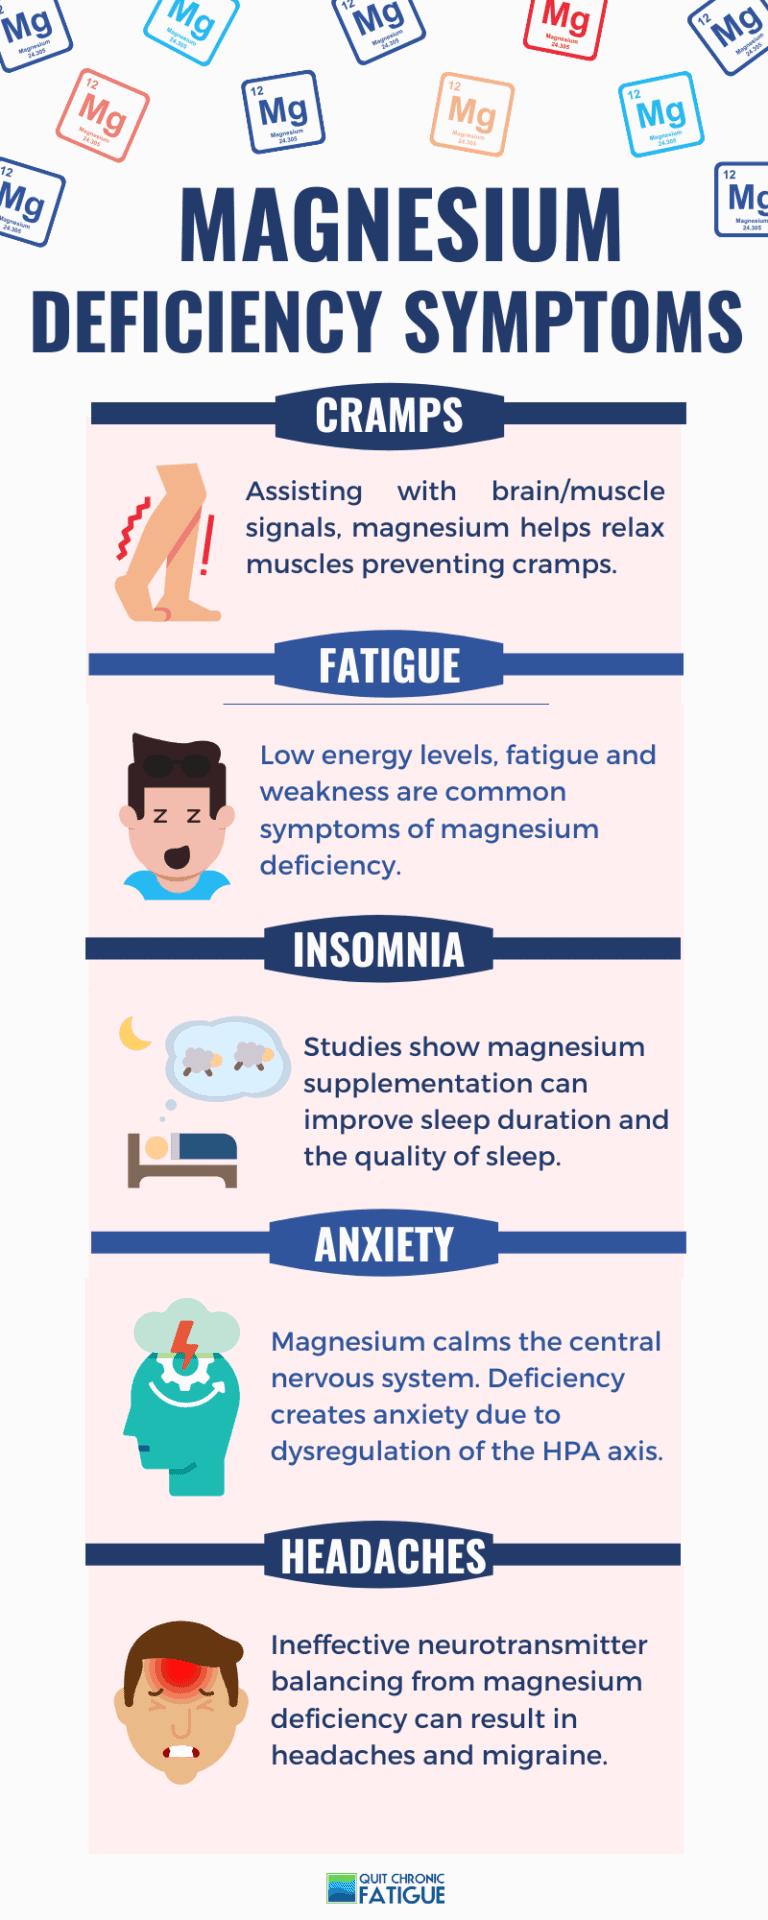 magnesium deficiency symptoms infographic